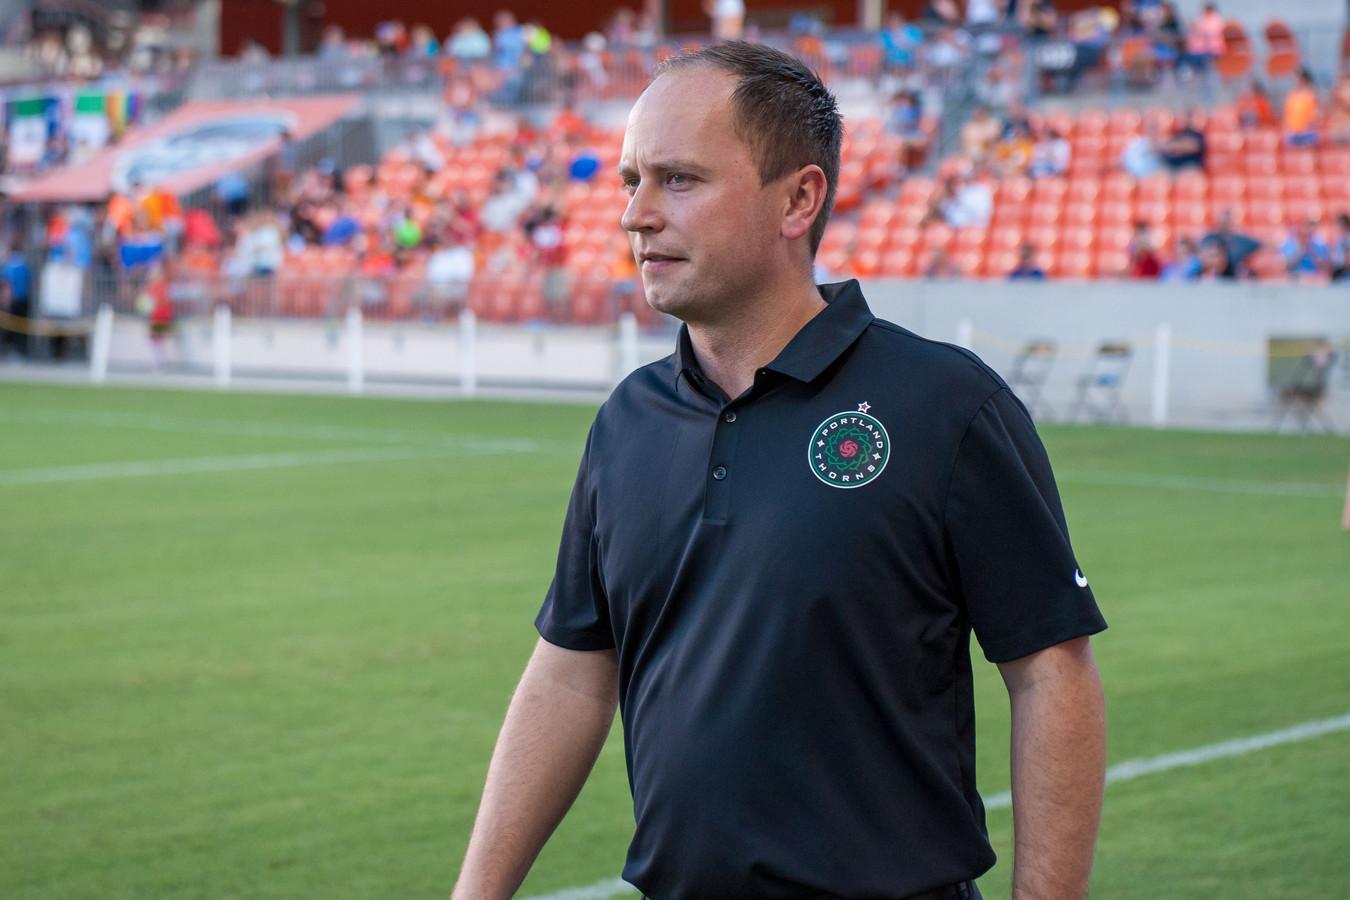 Mark Parsons als coach van Portland Thorns in oktober 2016.